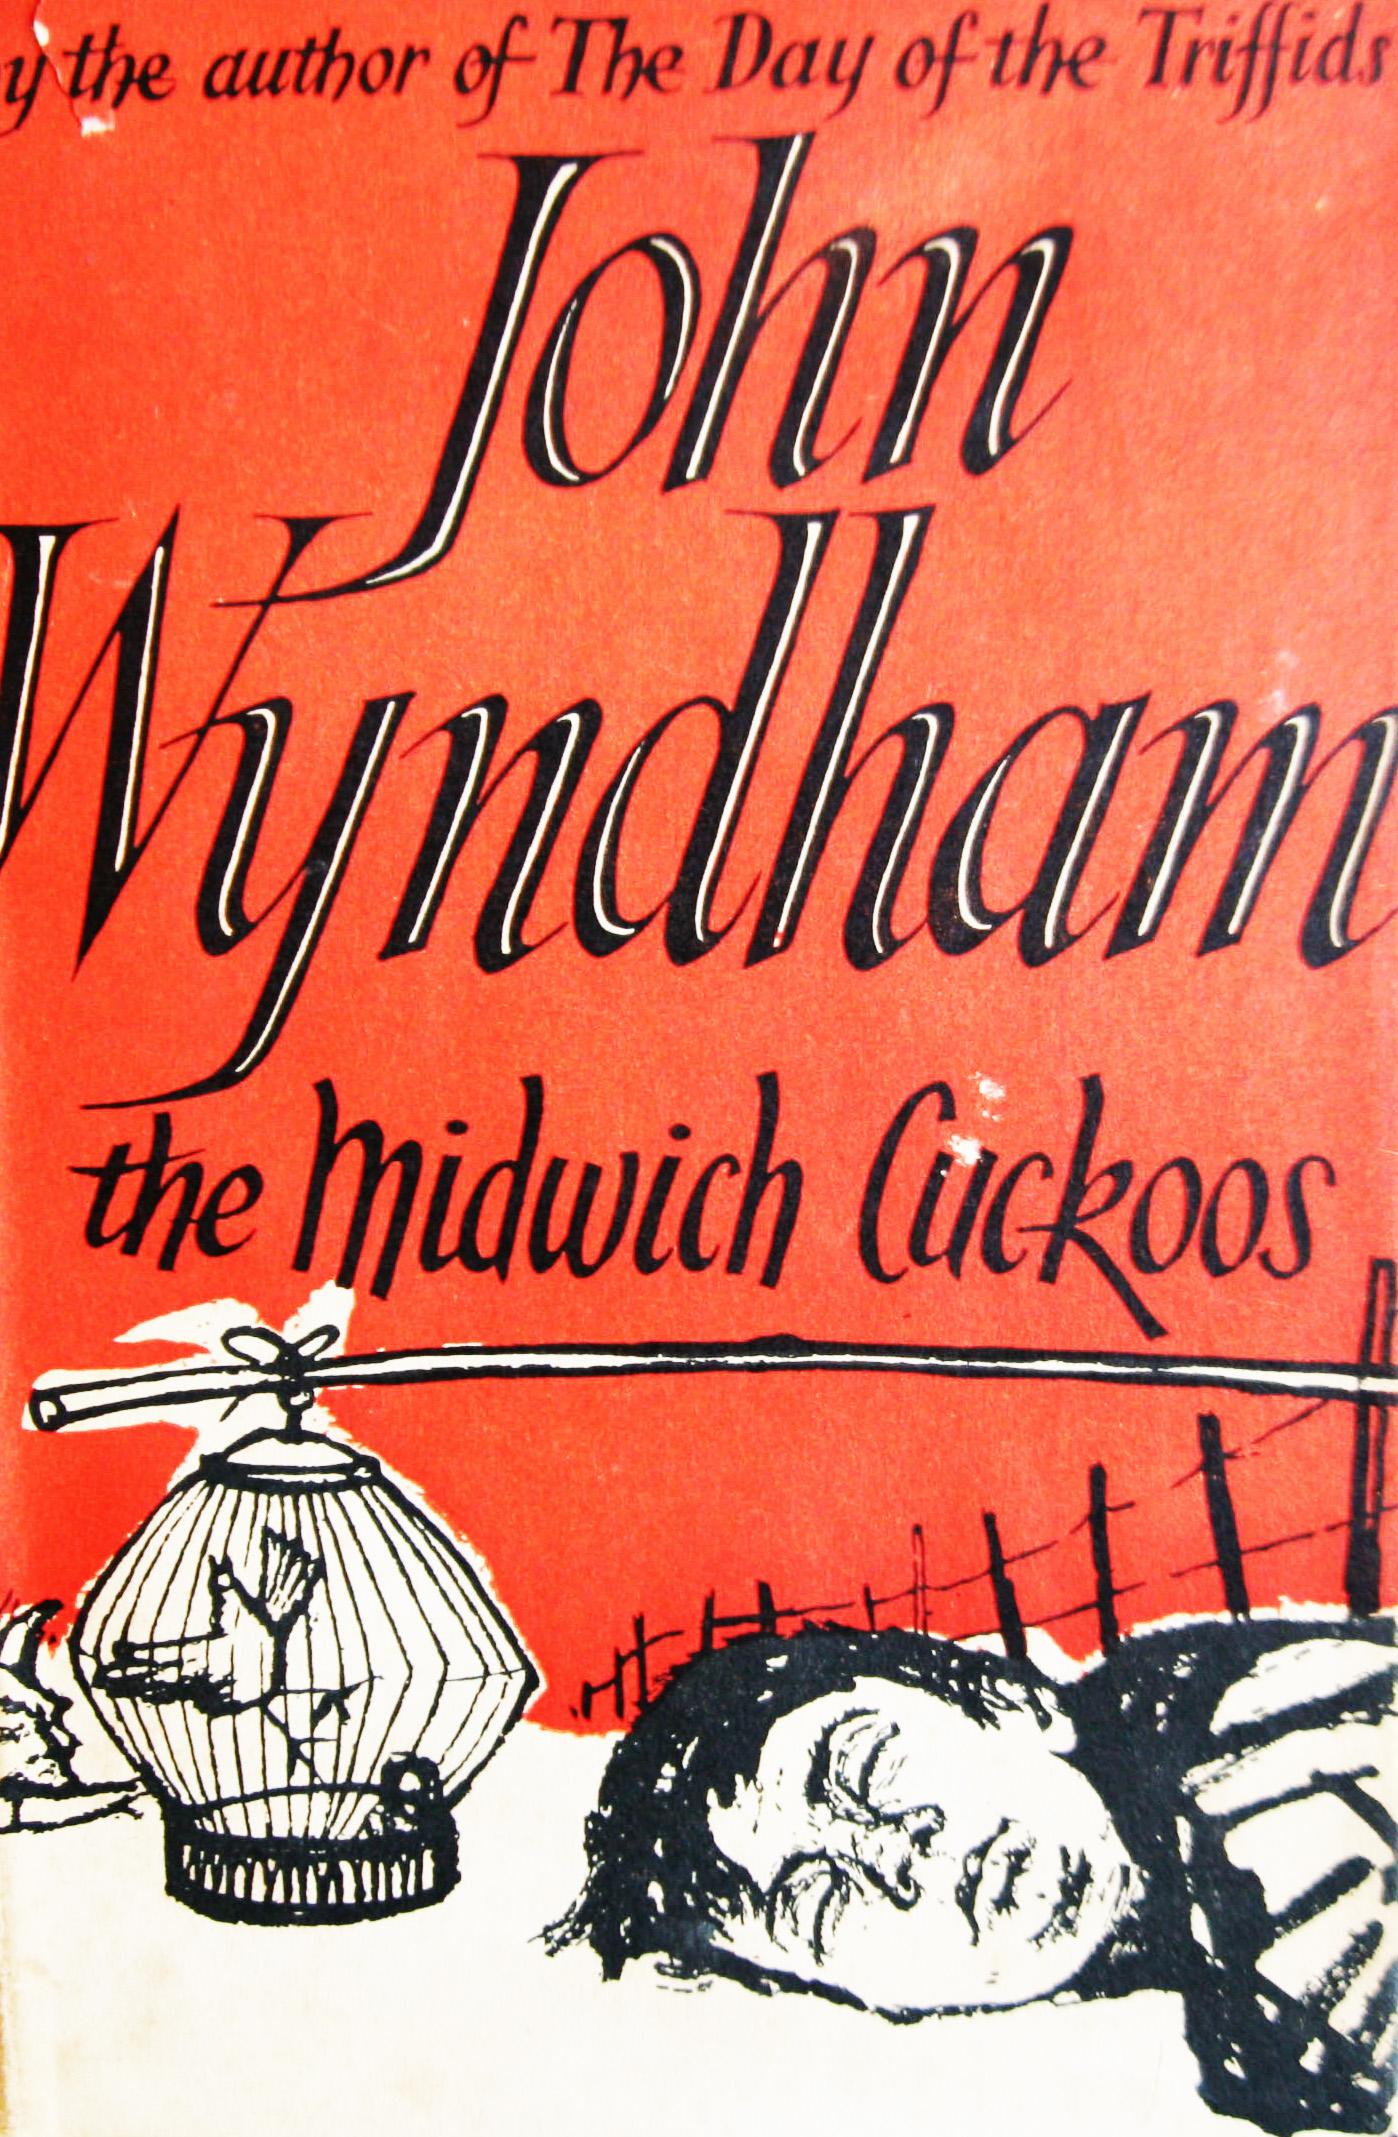 John Wyndham The Midwich Cuckoos first edition